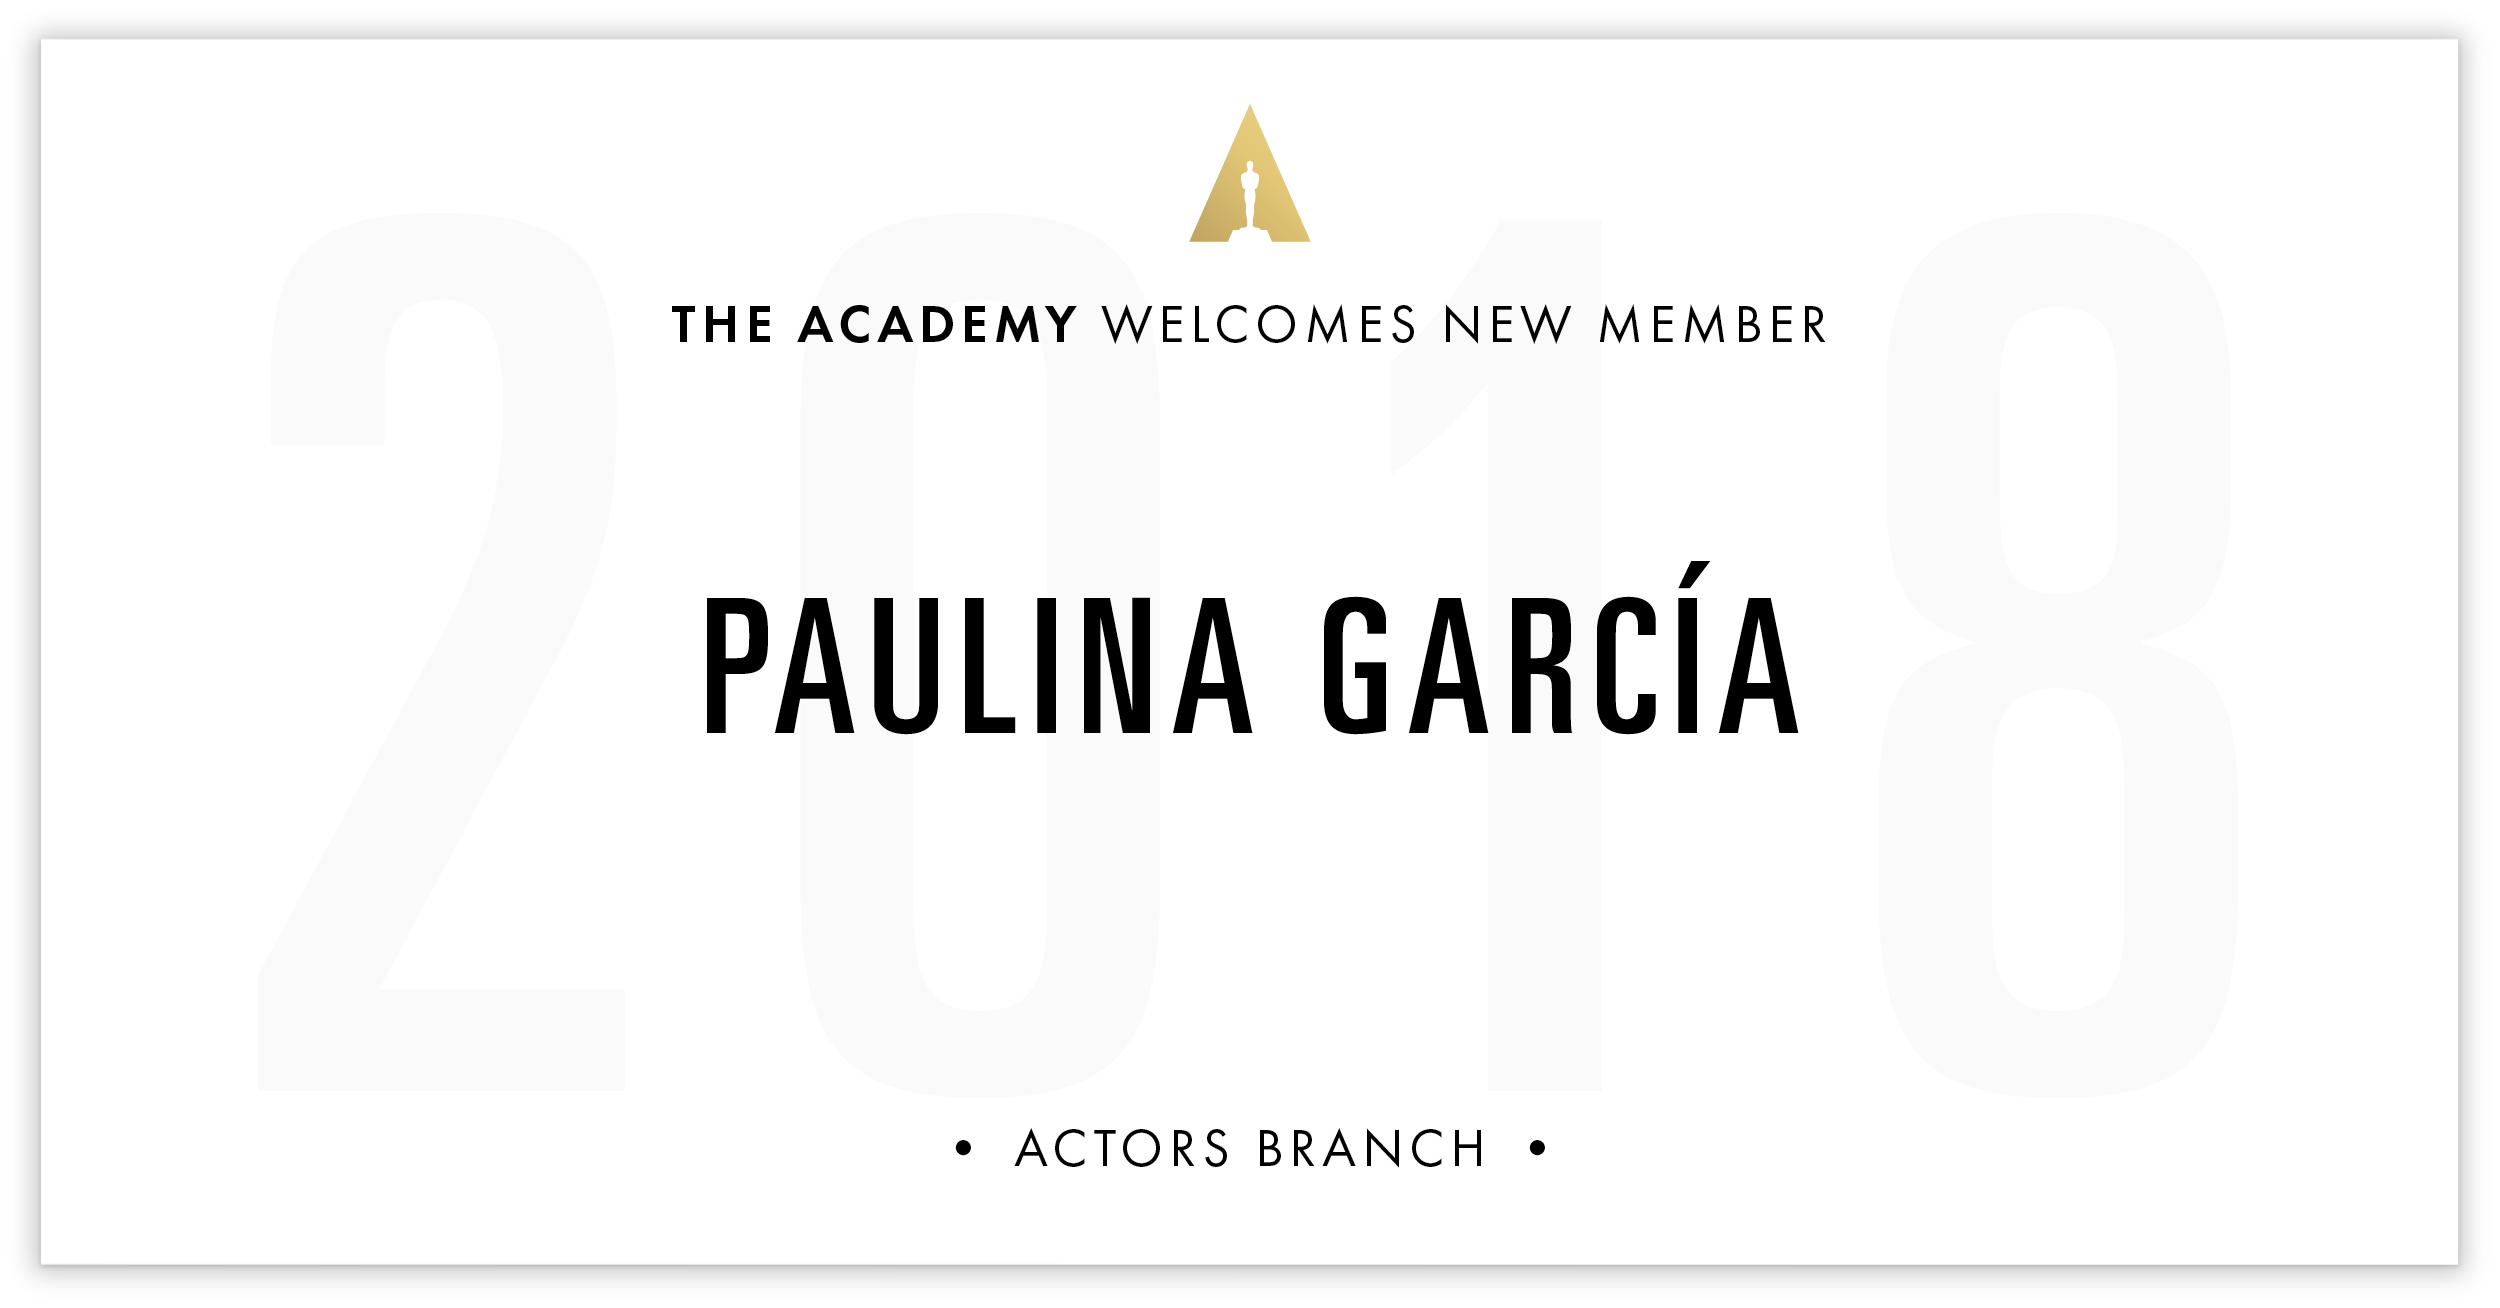 Paulina García is invited!